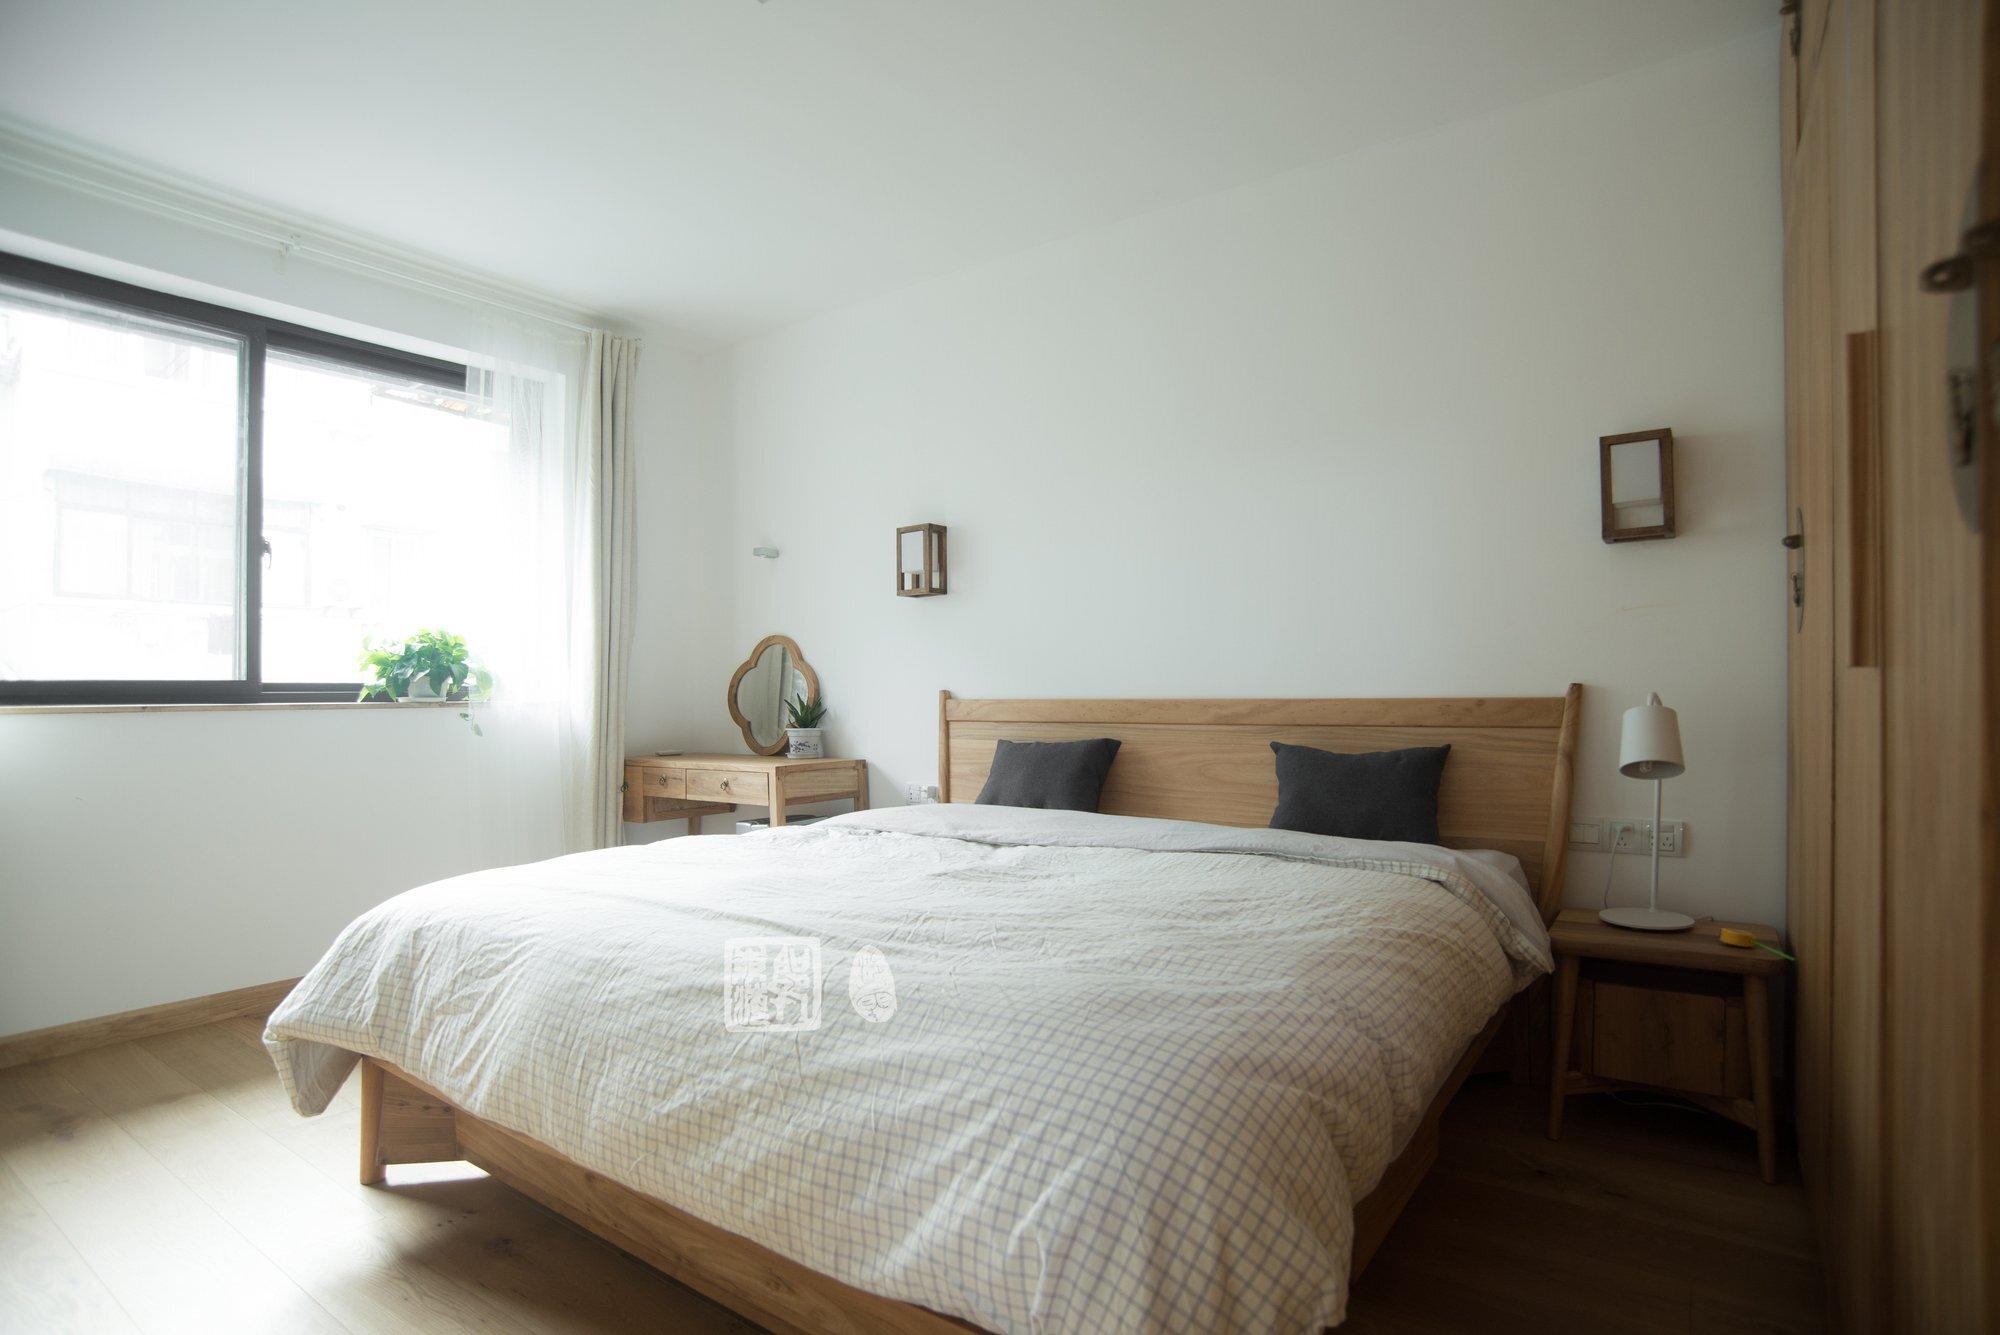 Traditional Chinese Home Design - Guo Donghai & Yan Linglin - Shanghai China - Bedroom - Humble Homes